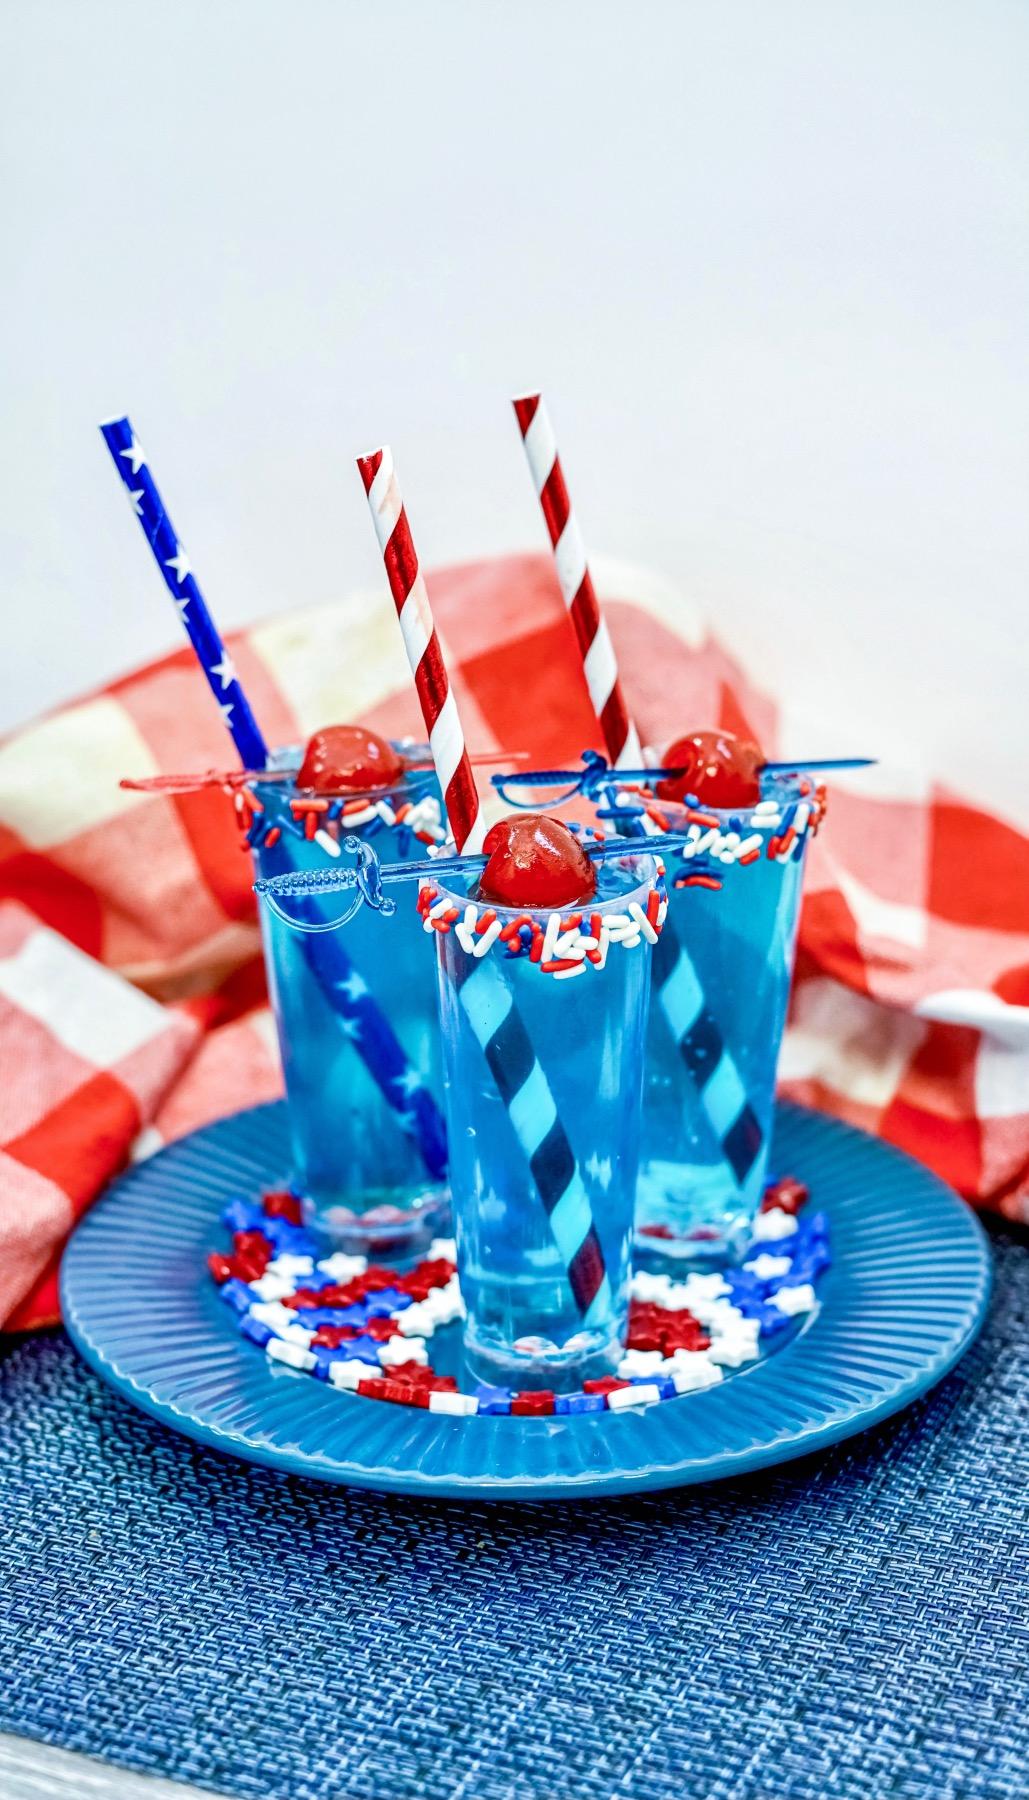 calypso lemonade and smirnoff red, white, and berry shots recipe